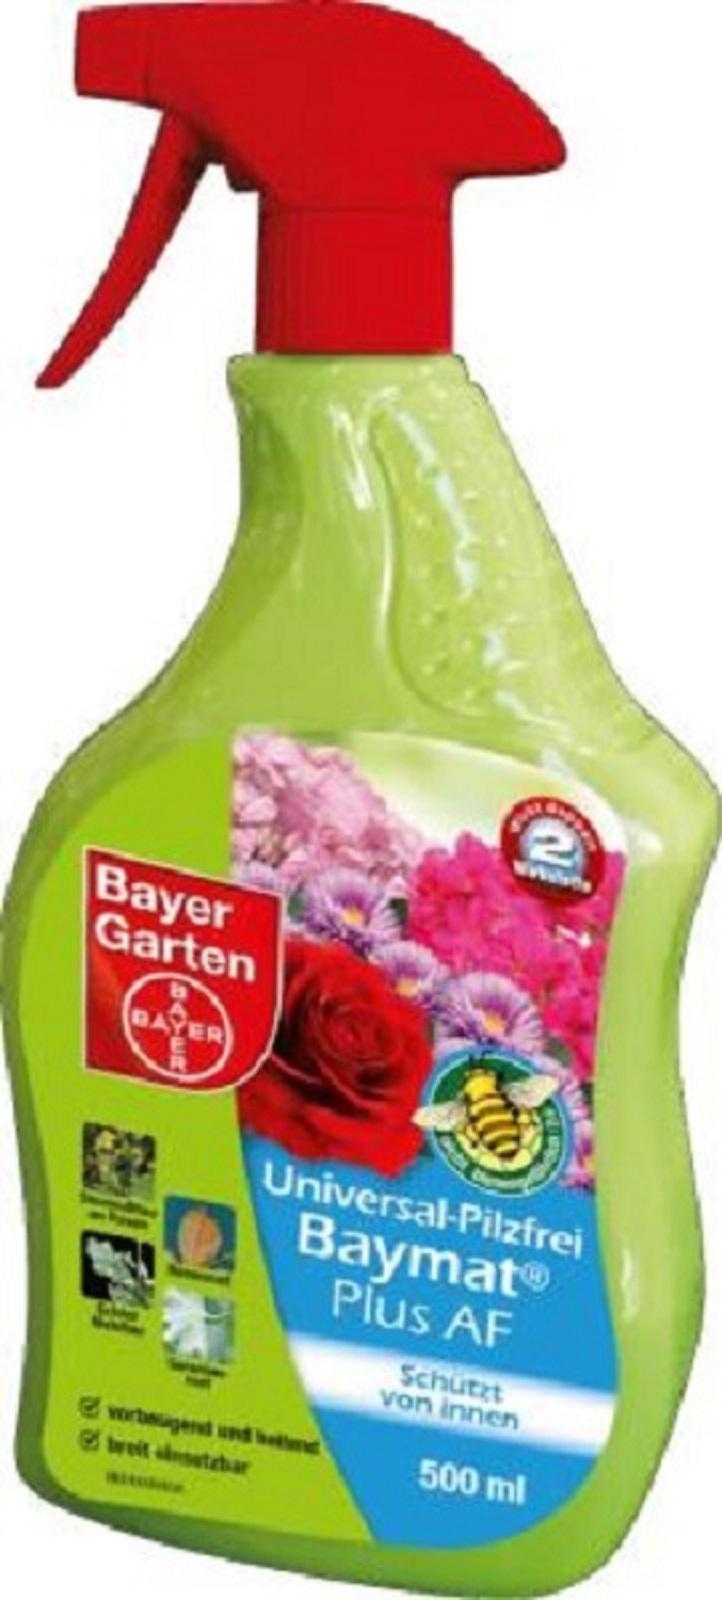 Bayer Universal-Pilzfrei Baymat Plus AF 500 ml